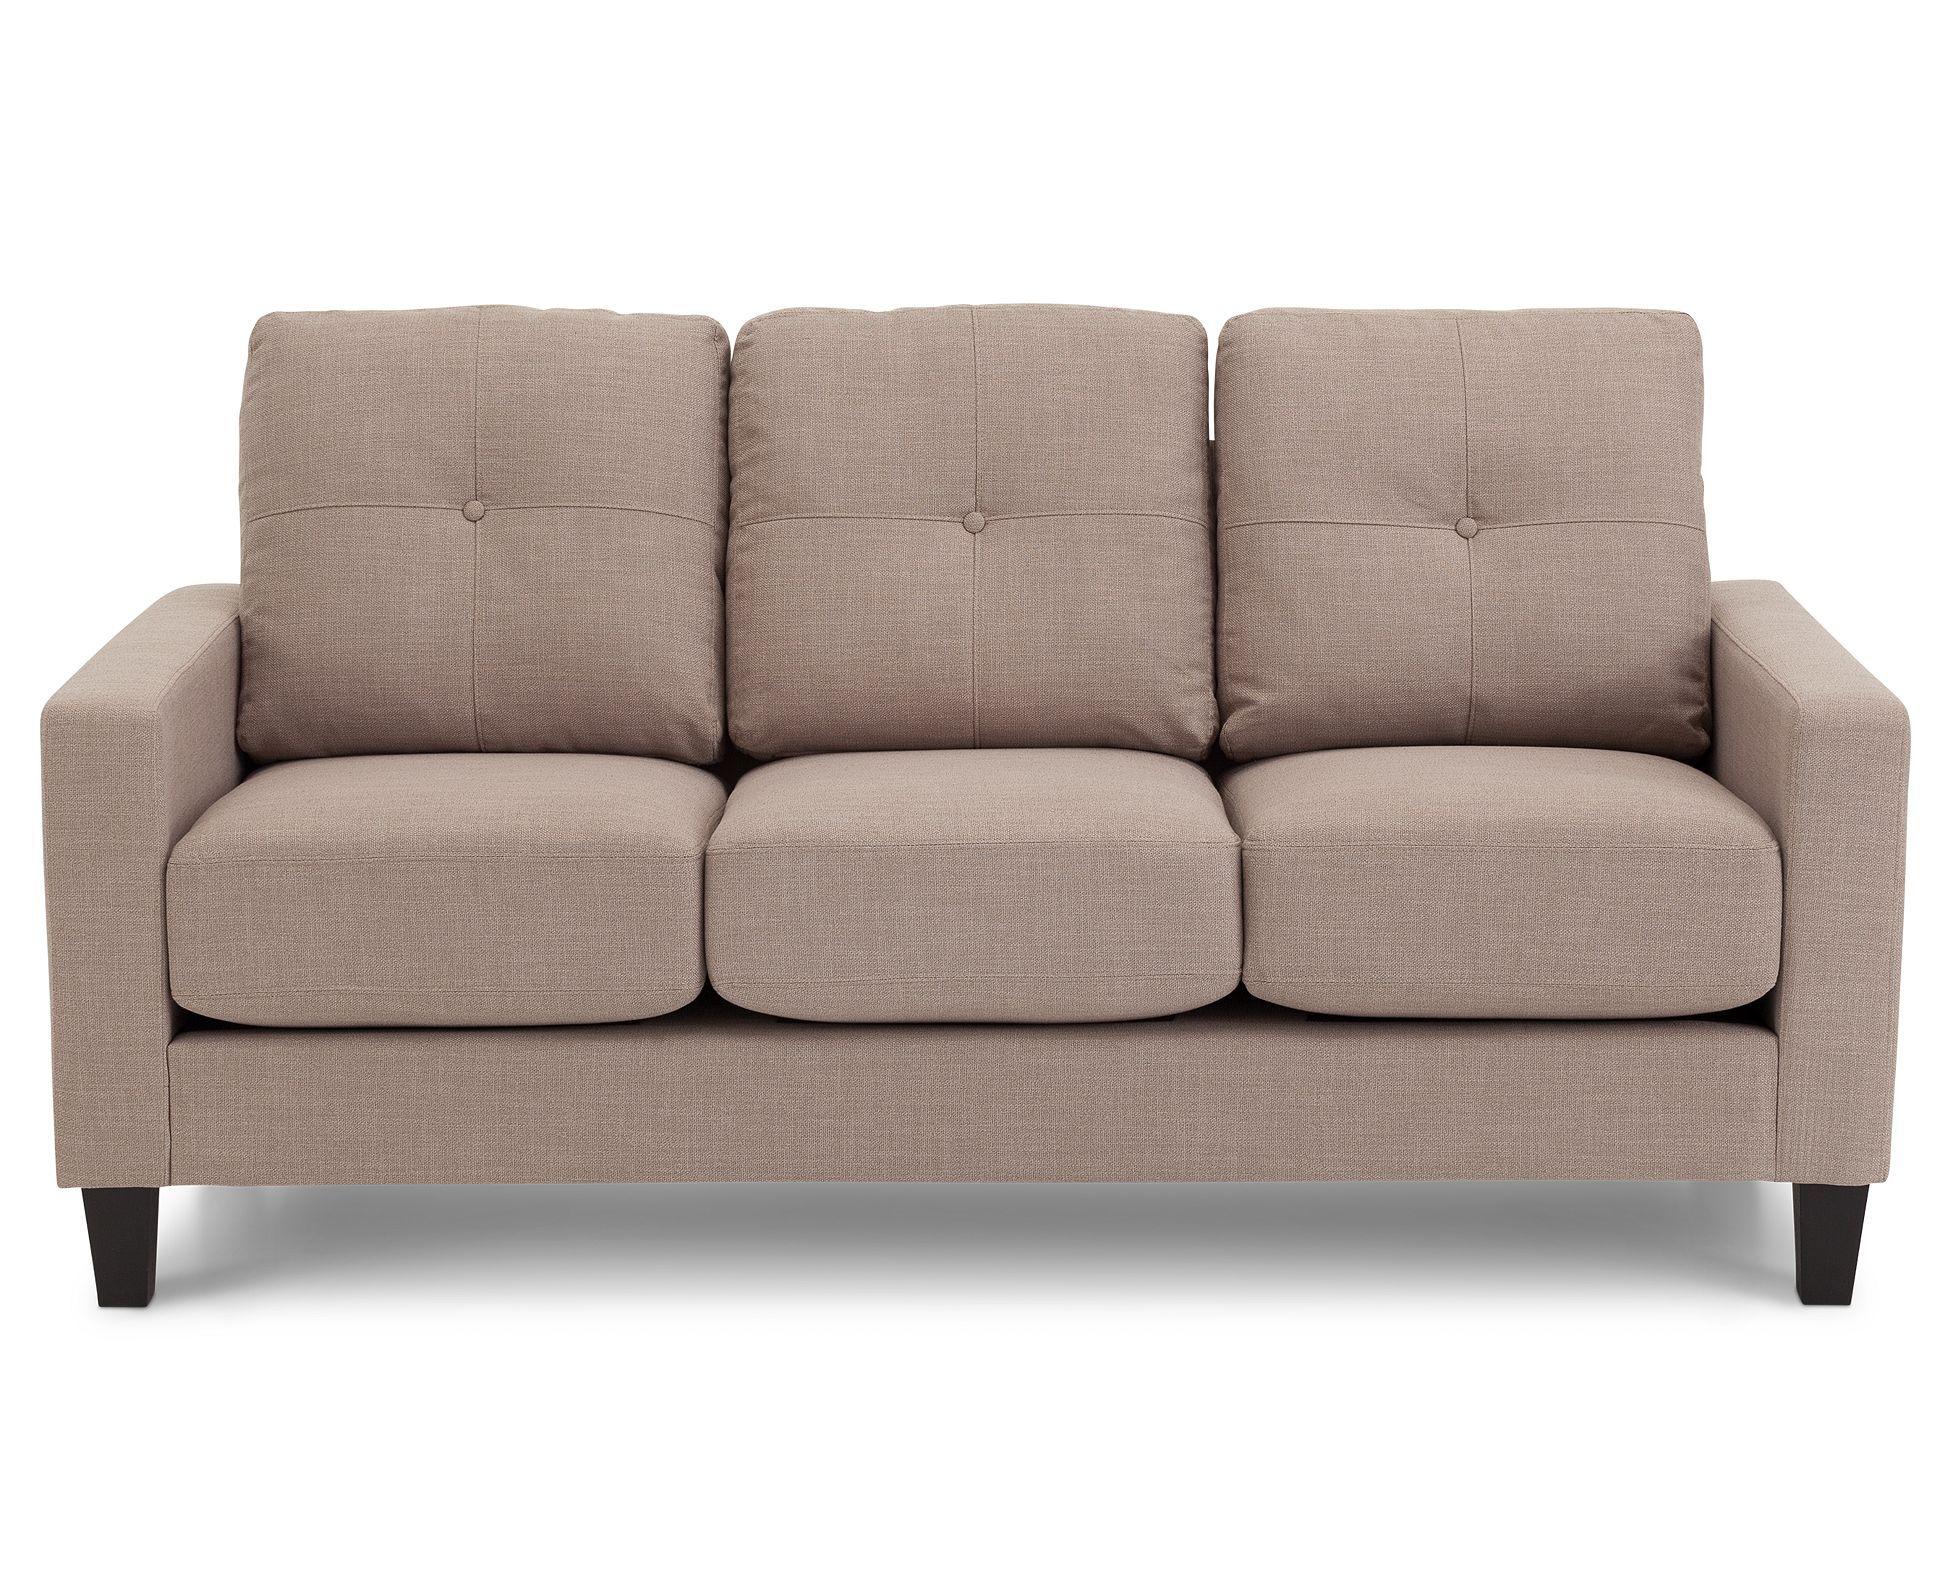 Tahoe Sofa Sofa Rowe Furniture Furniture Loveseat